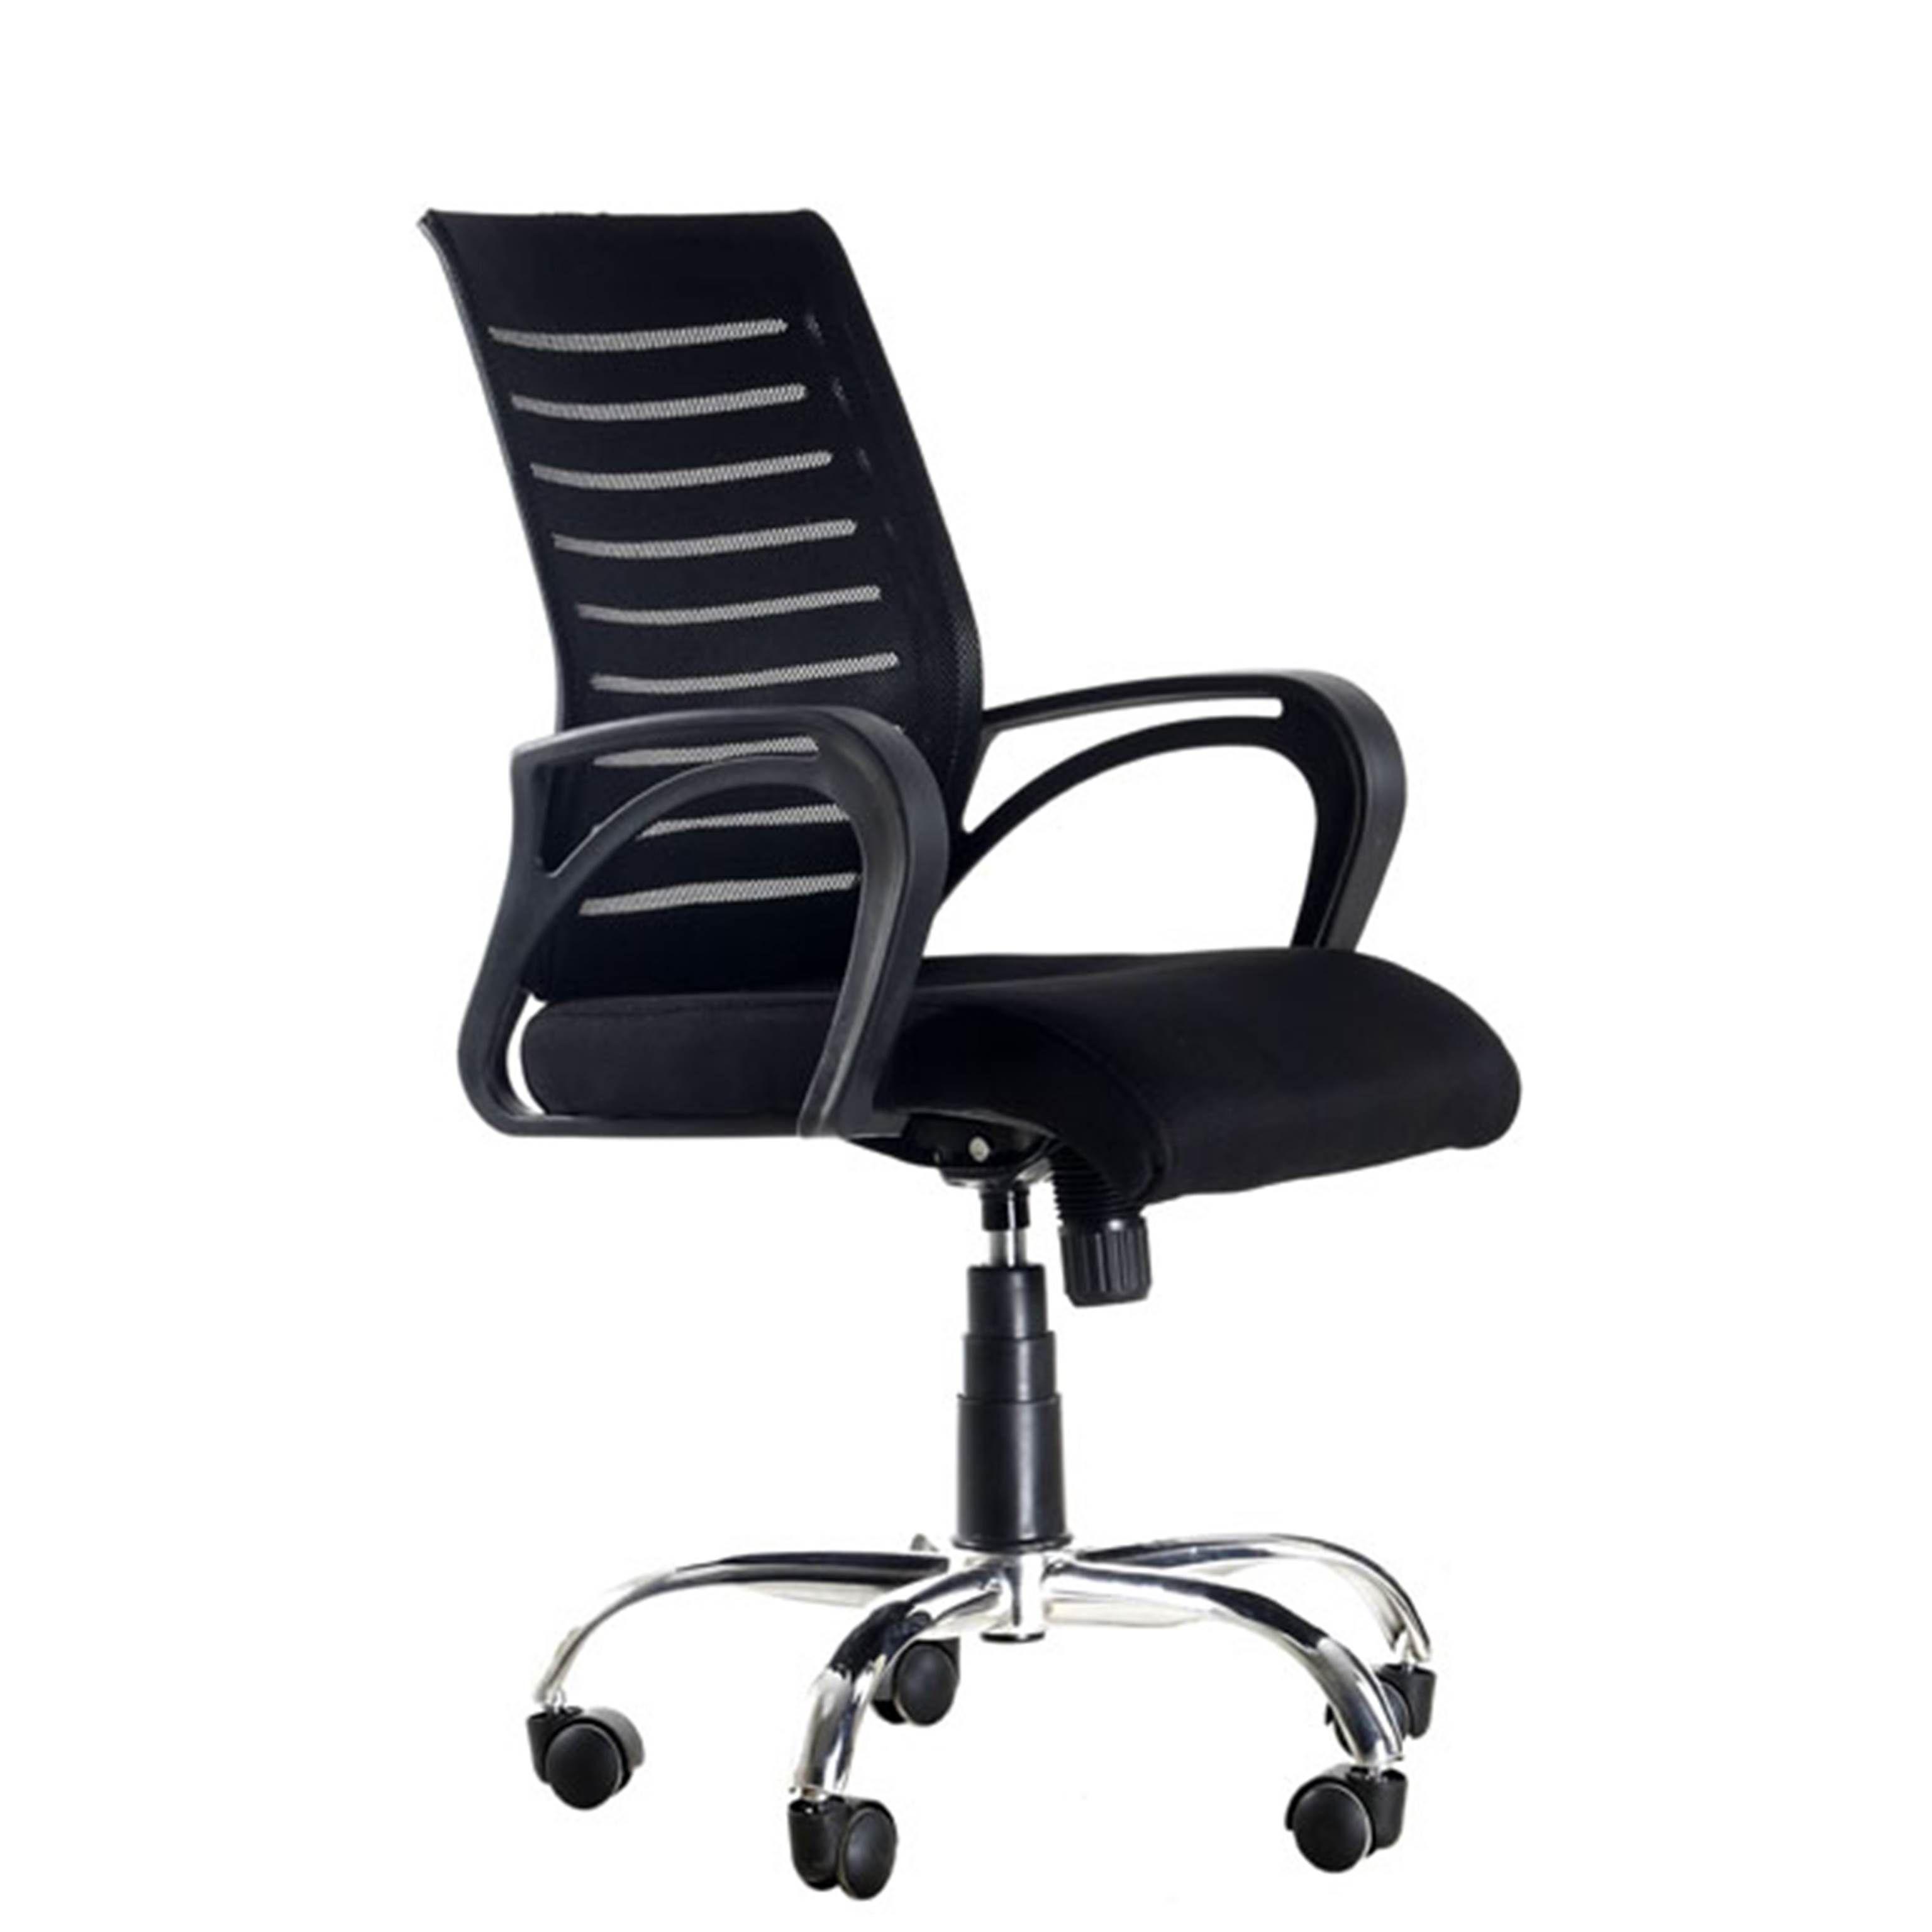 office chair online eames dowel regent boom high back buy